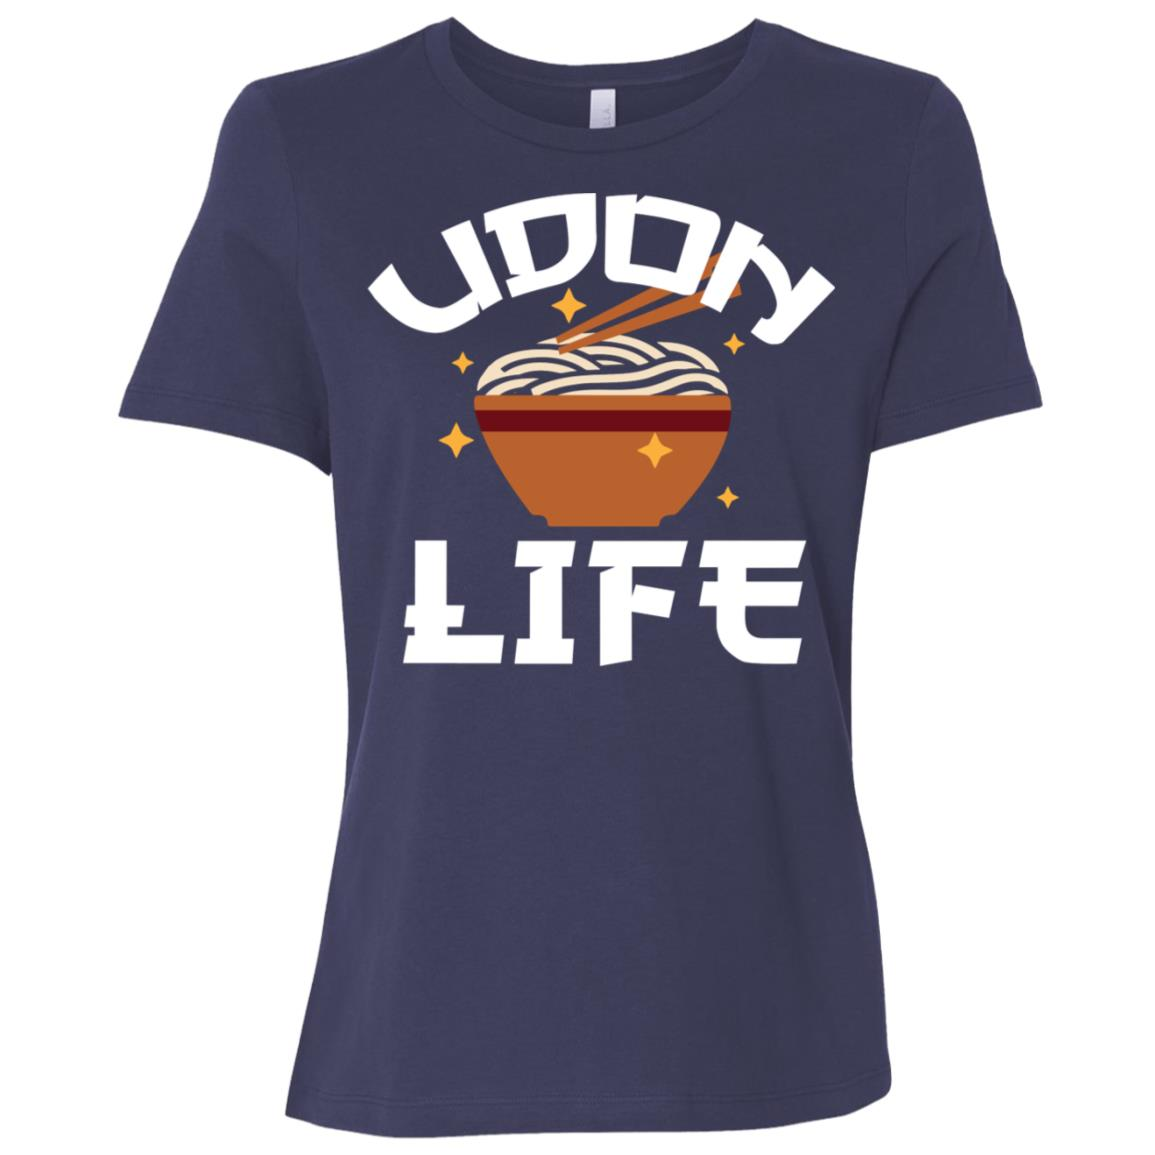 Japanese Udon Life Anime Tee Food Lover Pun Gift Women Short Sleeve T-Shirt